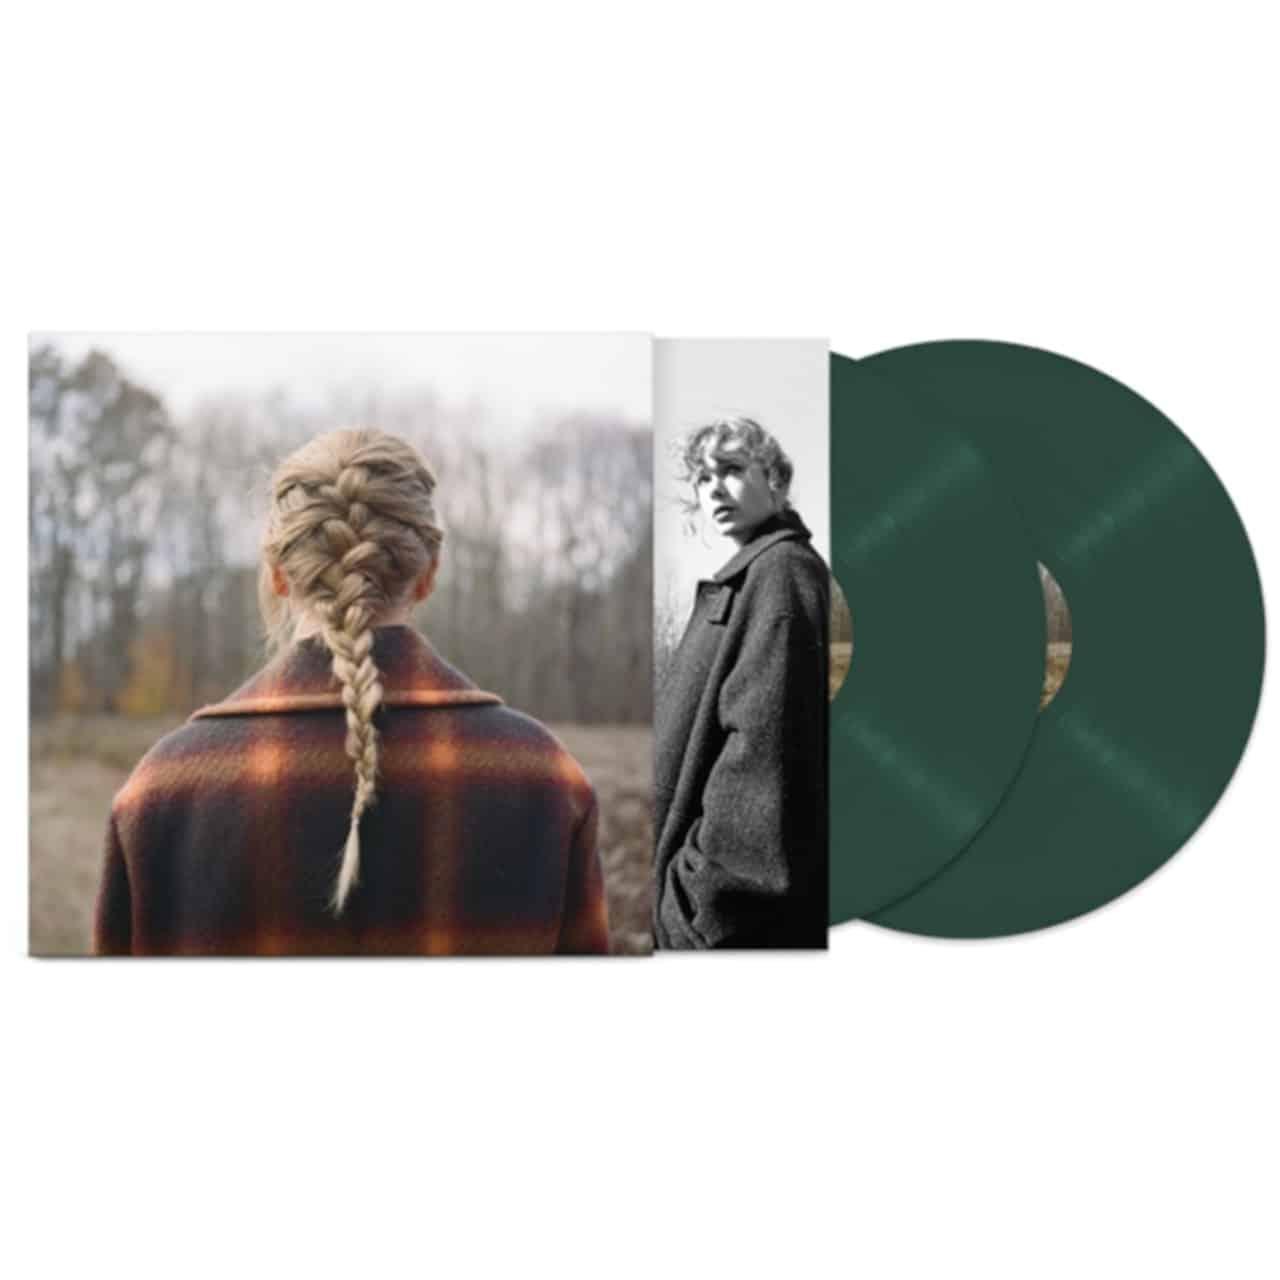 TAYLOR SWIFT - EVERMORE (green vinyl)